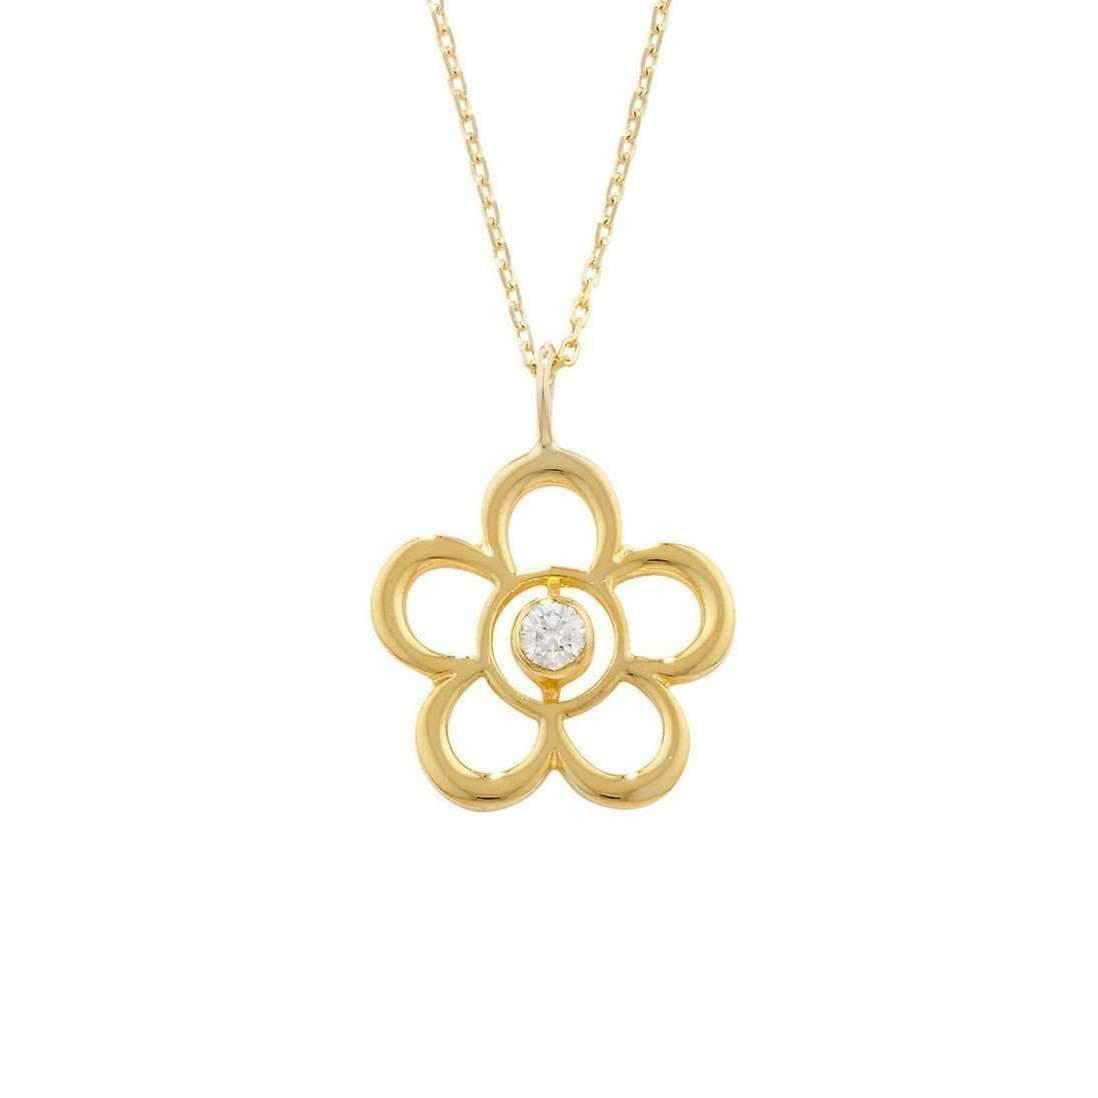 London Road Jewellery Kew Yellow Gold Posy Cluster Pendant 97Eo5H